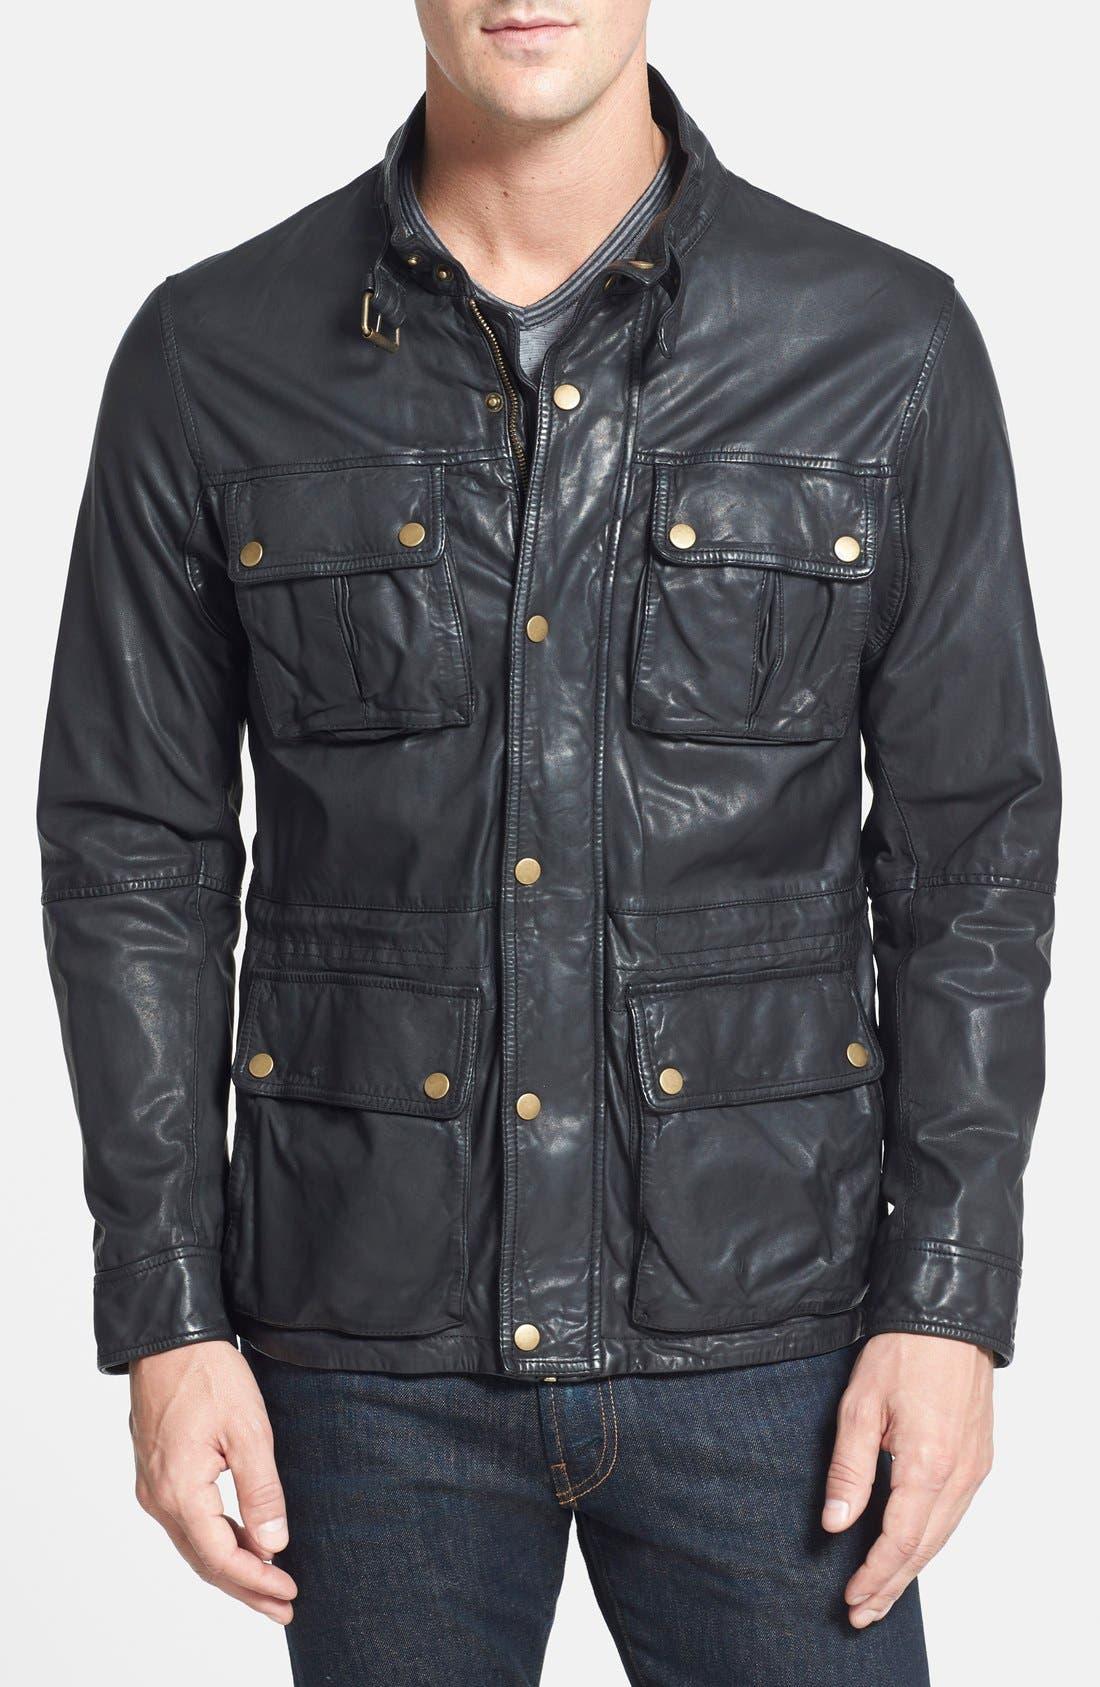 Main Image - Cole Haan Vintage Lambskin Leather Jacket